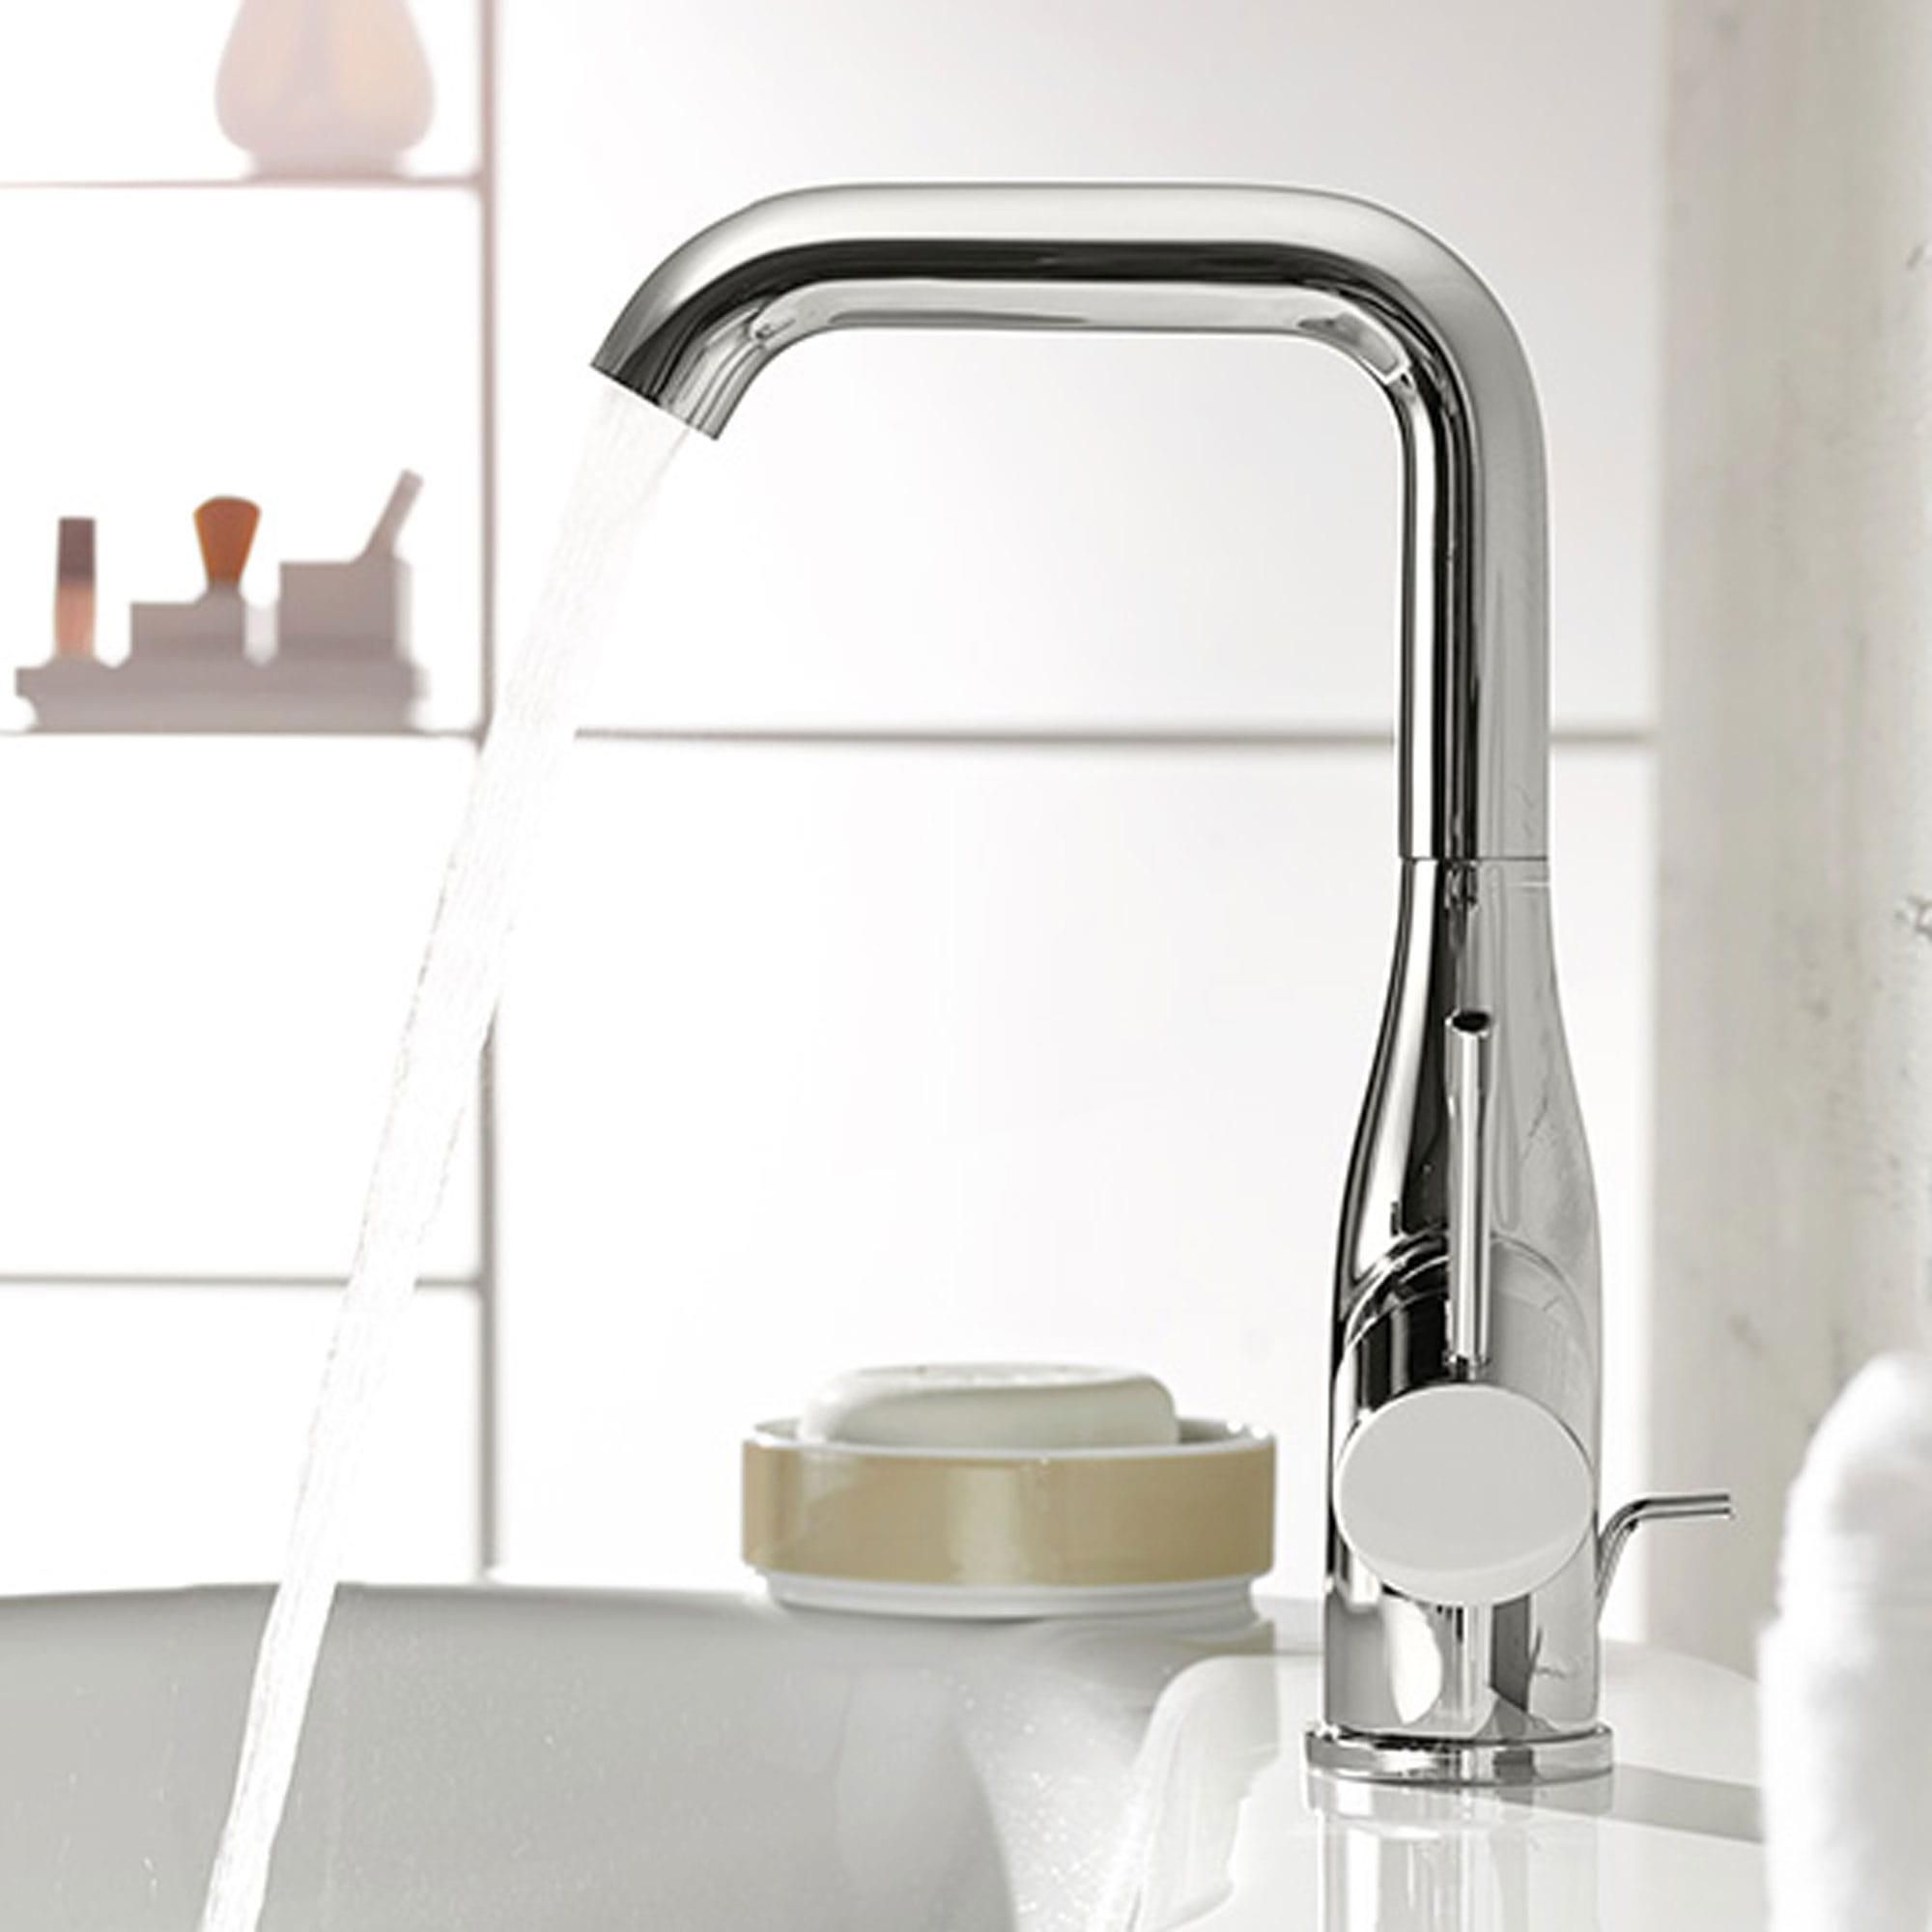 évier de salle de bain avec angle de l'eau courante